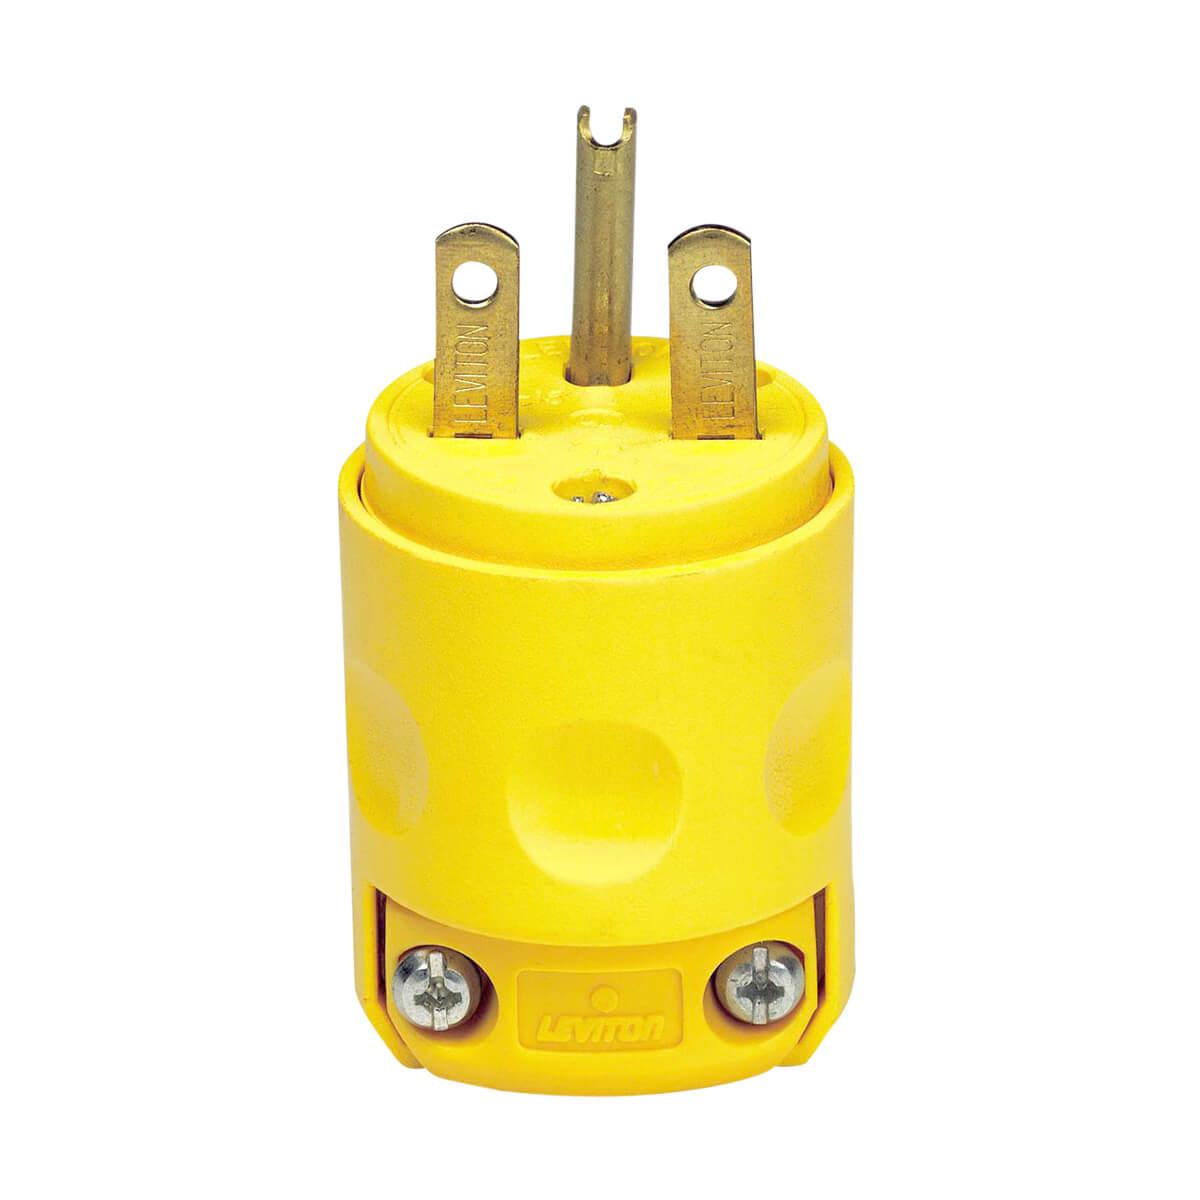 Leviton Yellow Vinyl Plug- 15A 250V